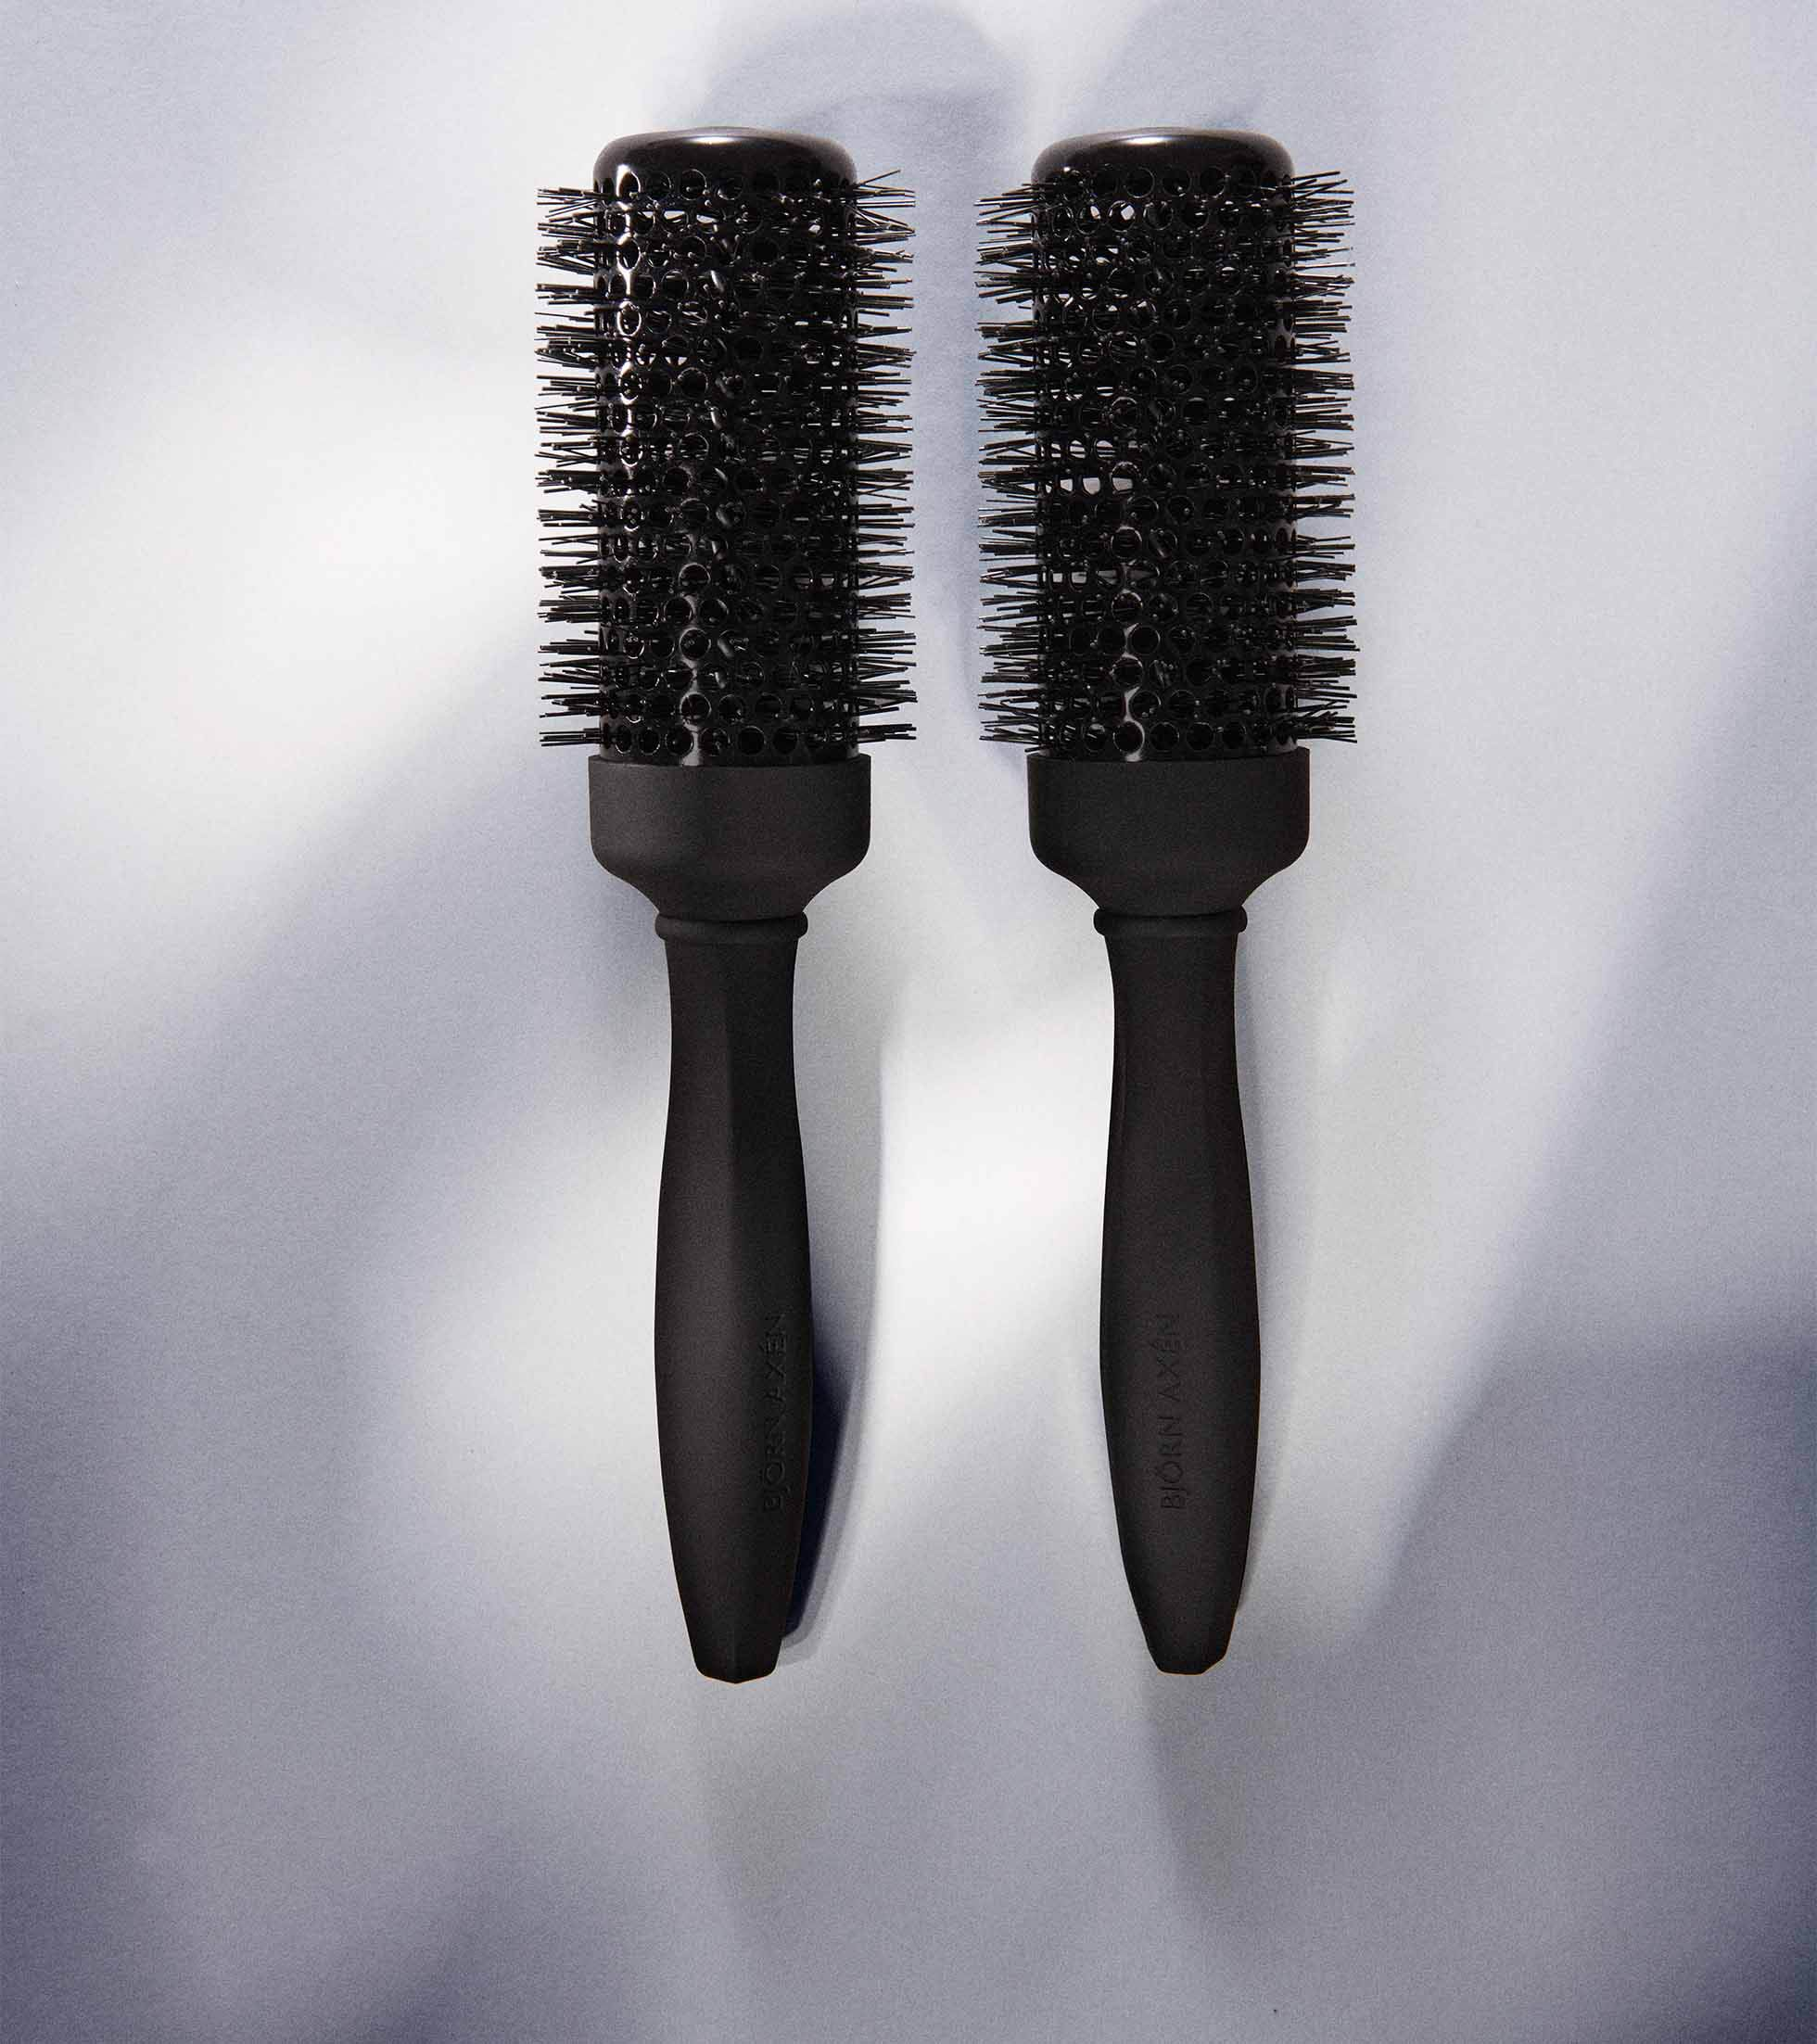 Blowout Brush Volume & Curls 43 mm